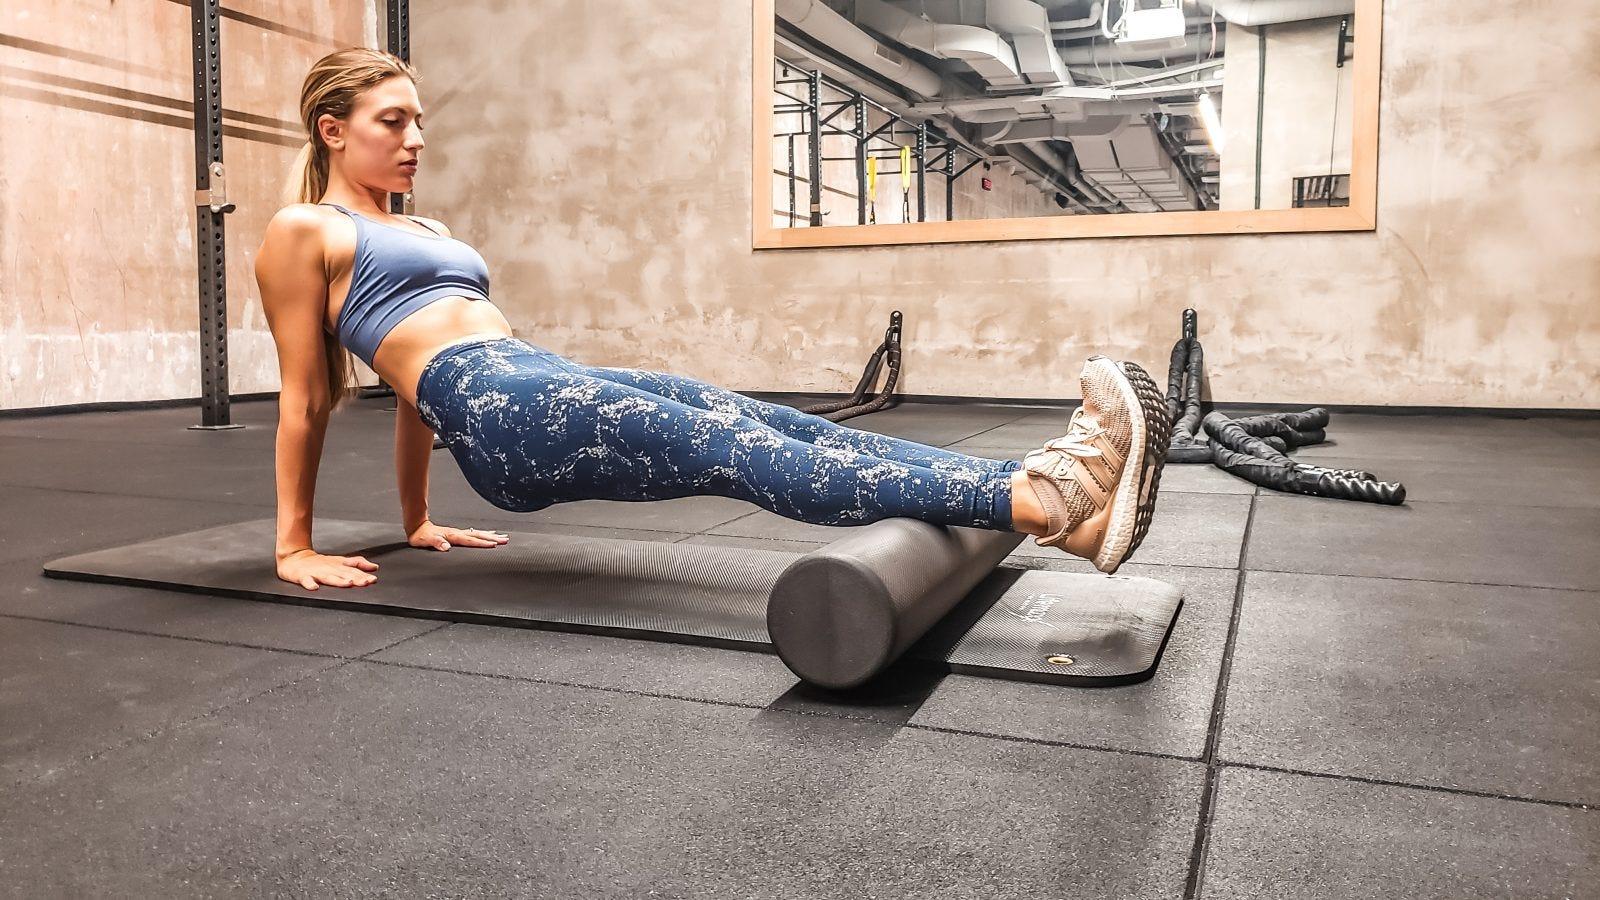 A woman in a gym foam rolling her calves.